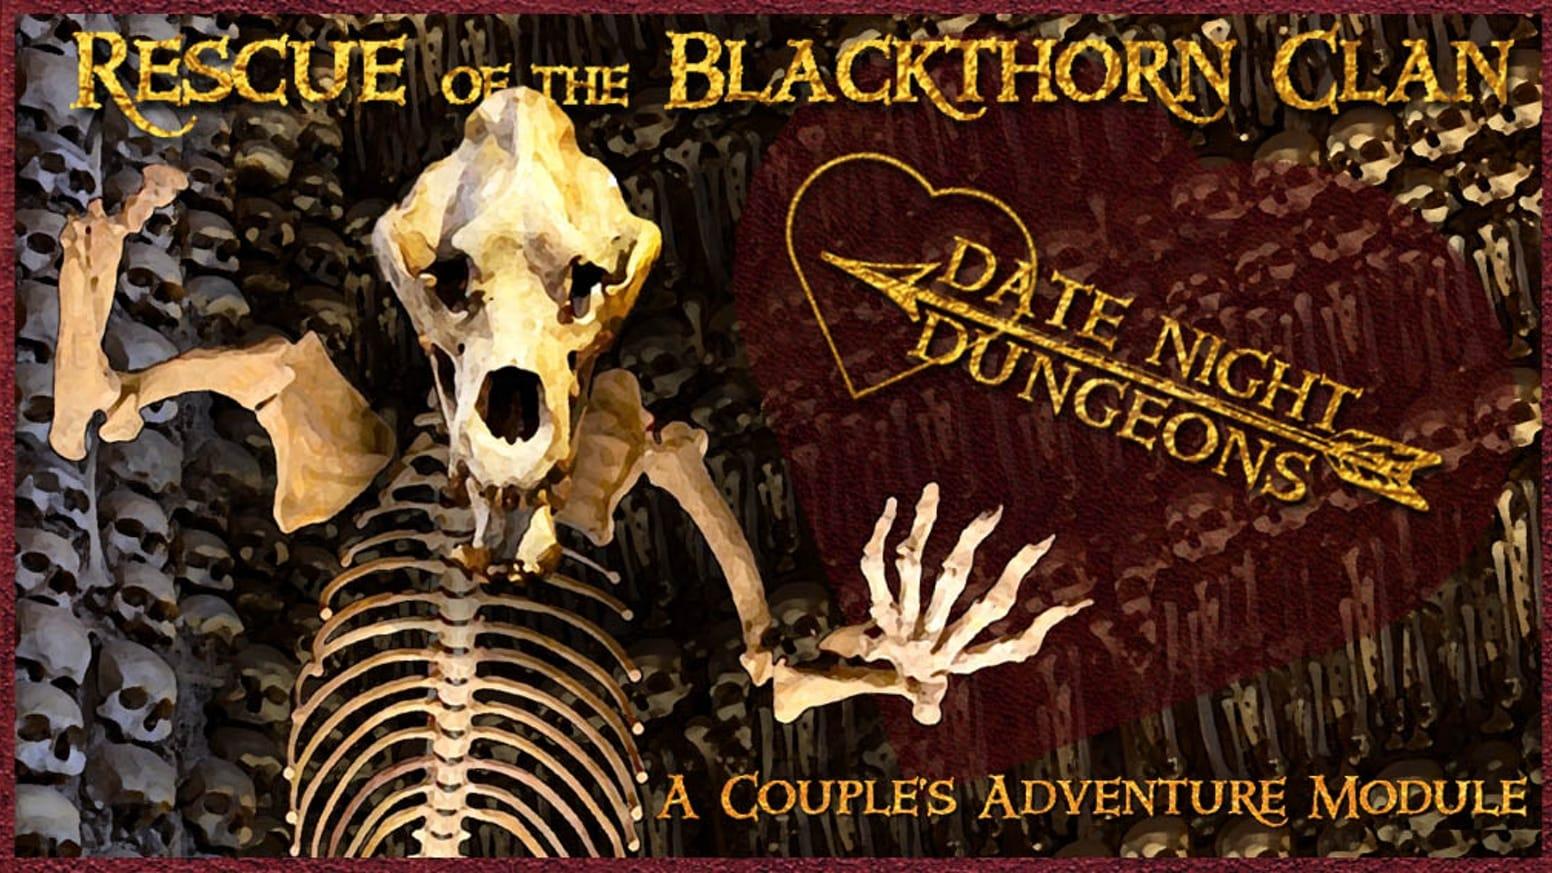 Date Night Dungeon